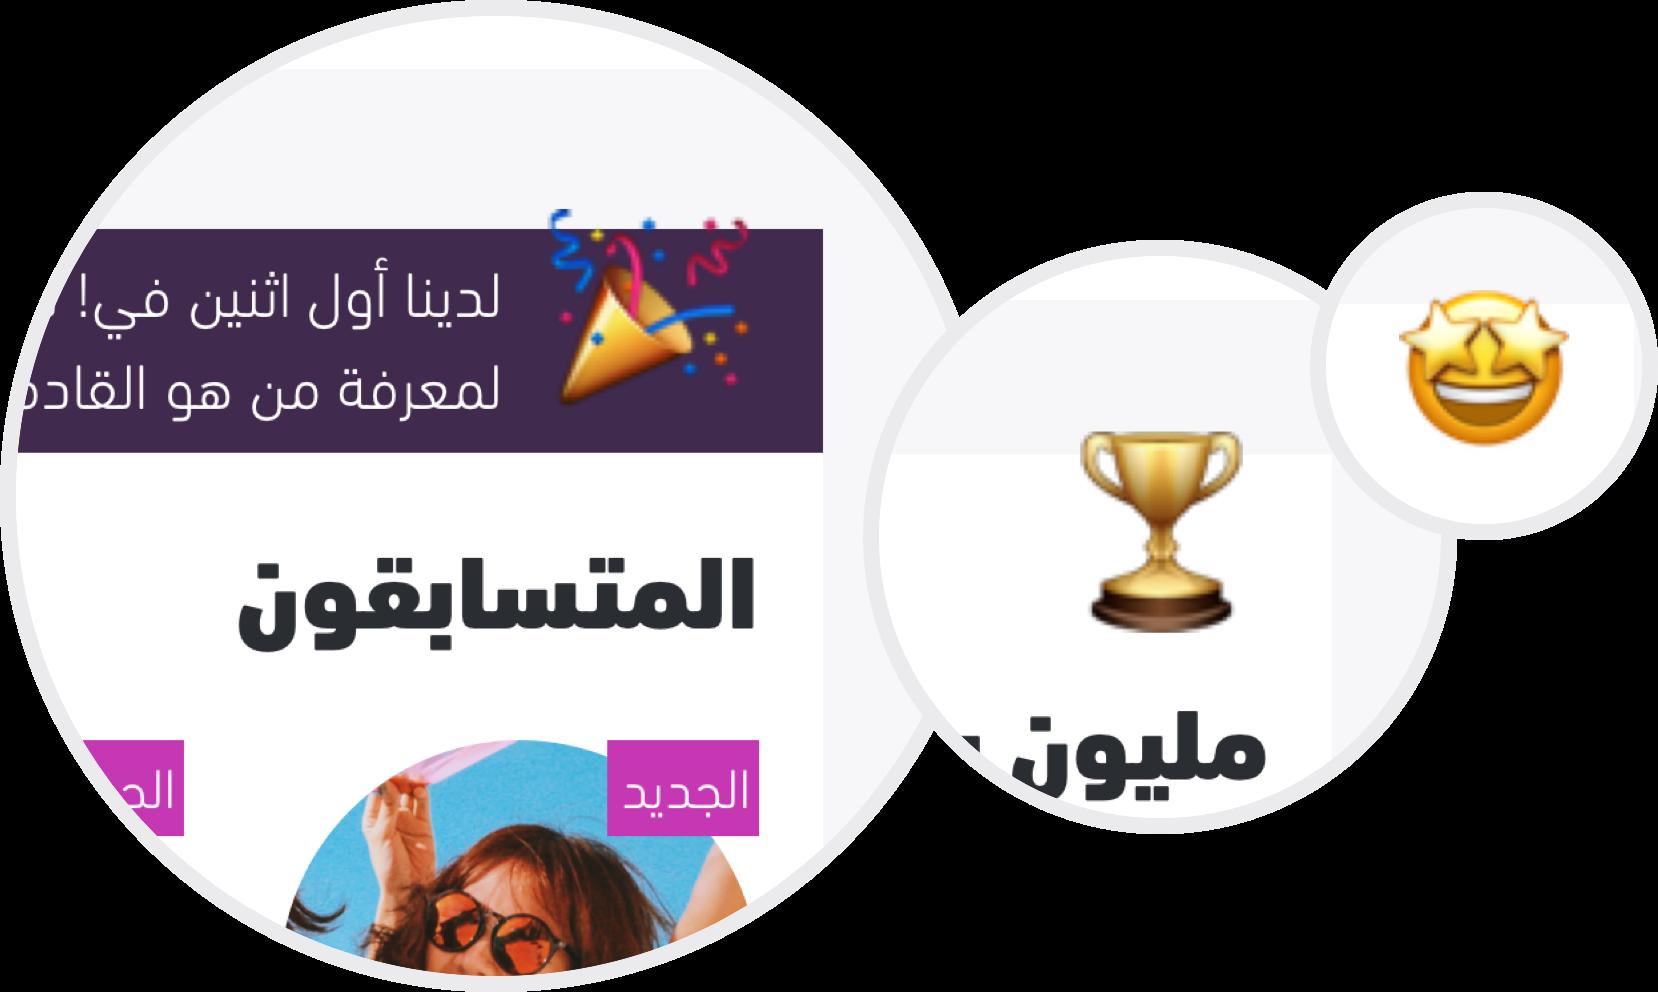 Emoji stickers bring social language through to website